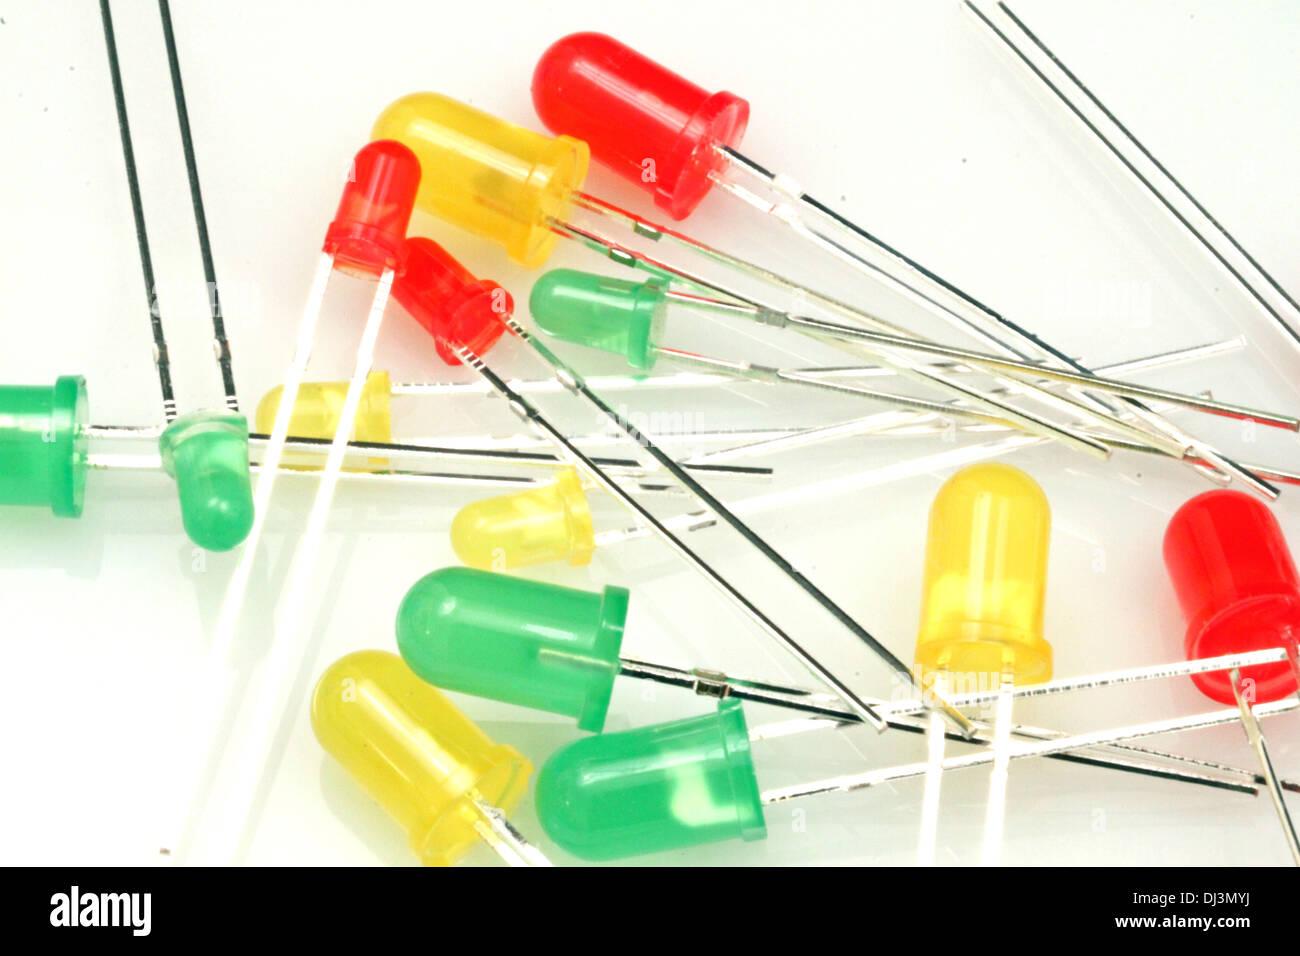 light emitting diodes stock photos amp light emitting diodes